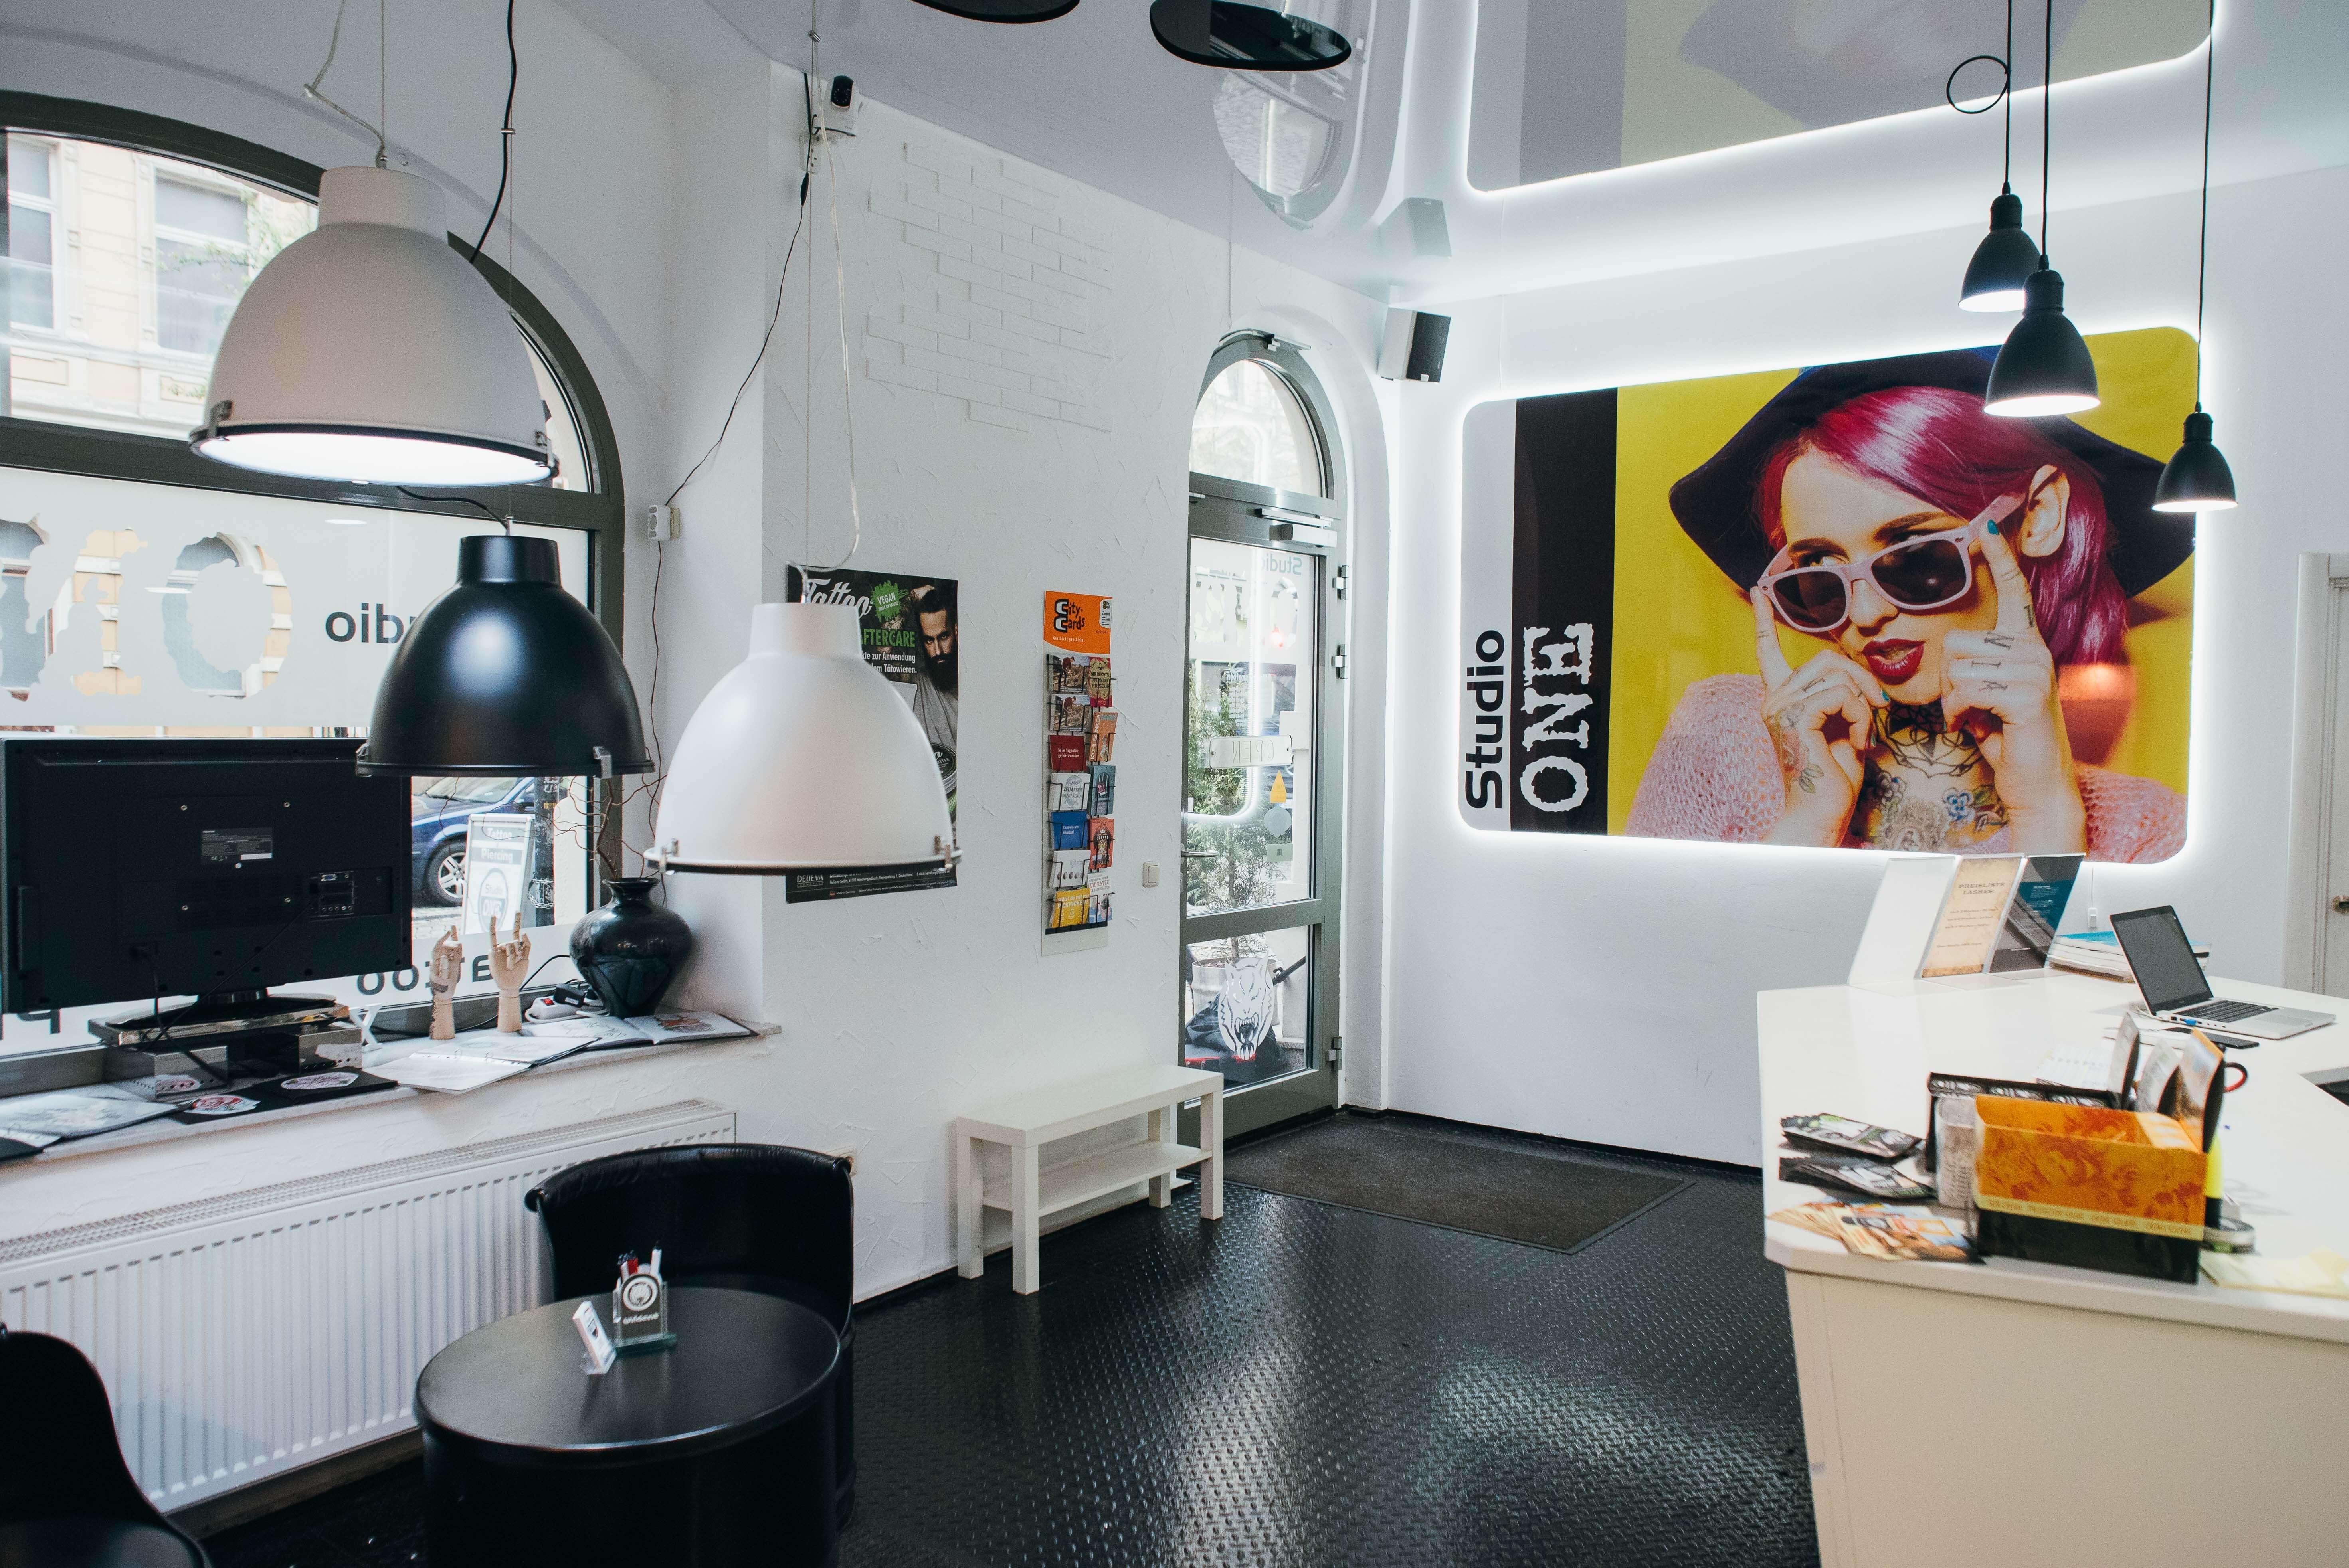 Chemnitz studio — Studio One